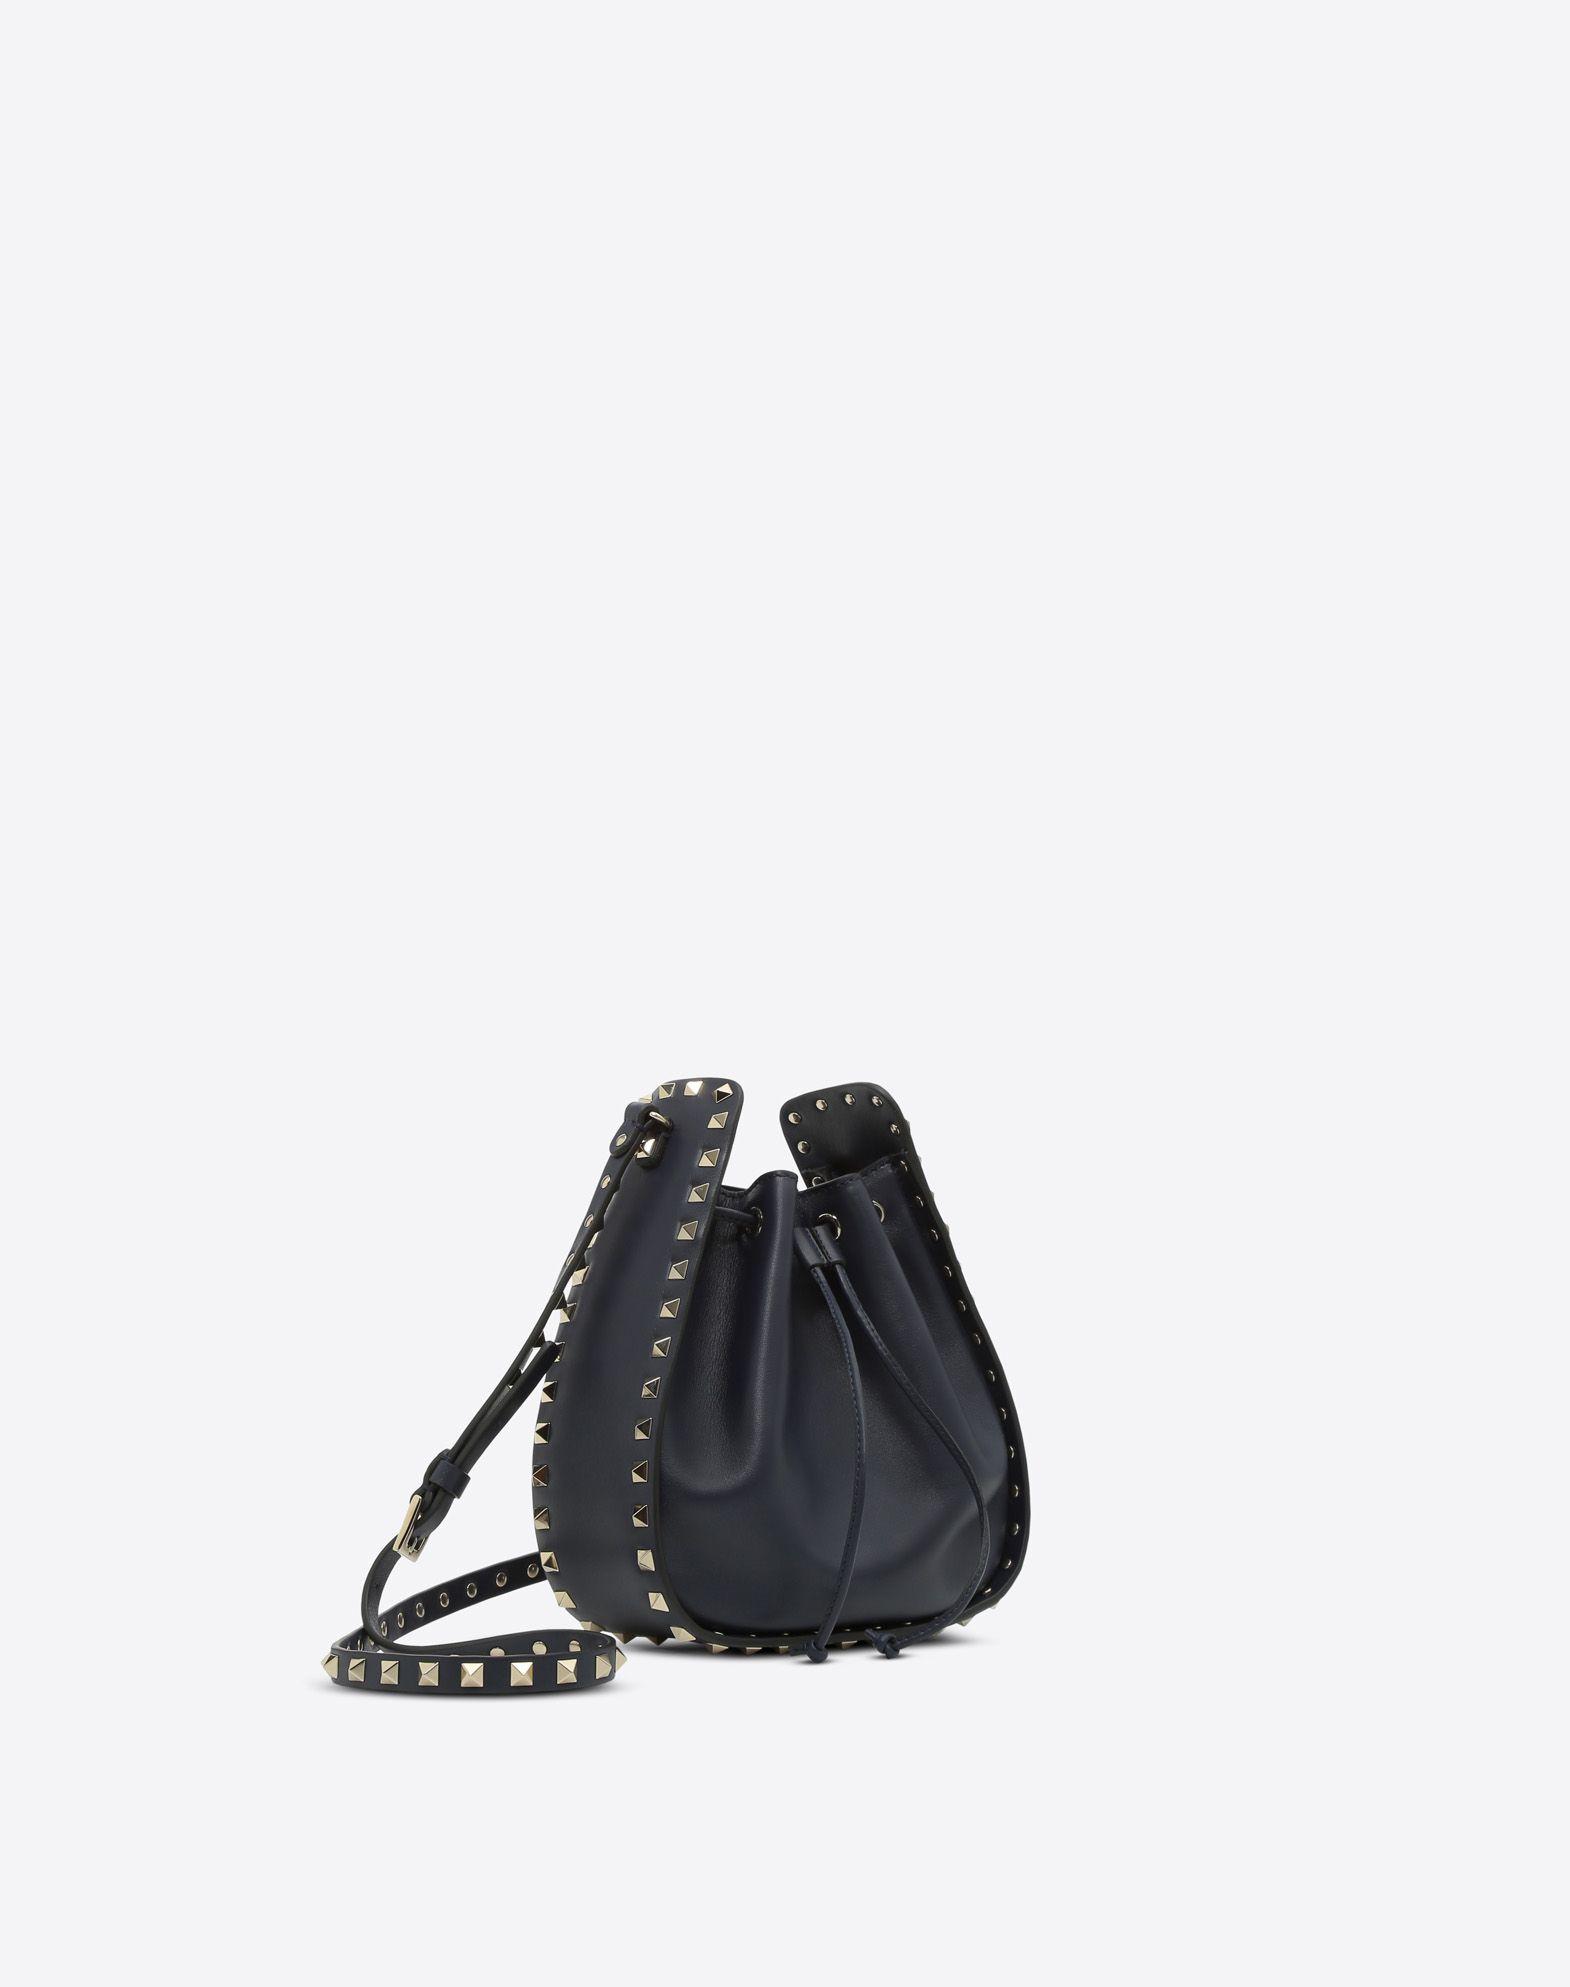 VALENTINO GARAVANI Rockstud Small Bucket Bag BUCKET BAG D r